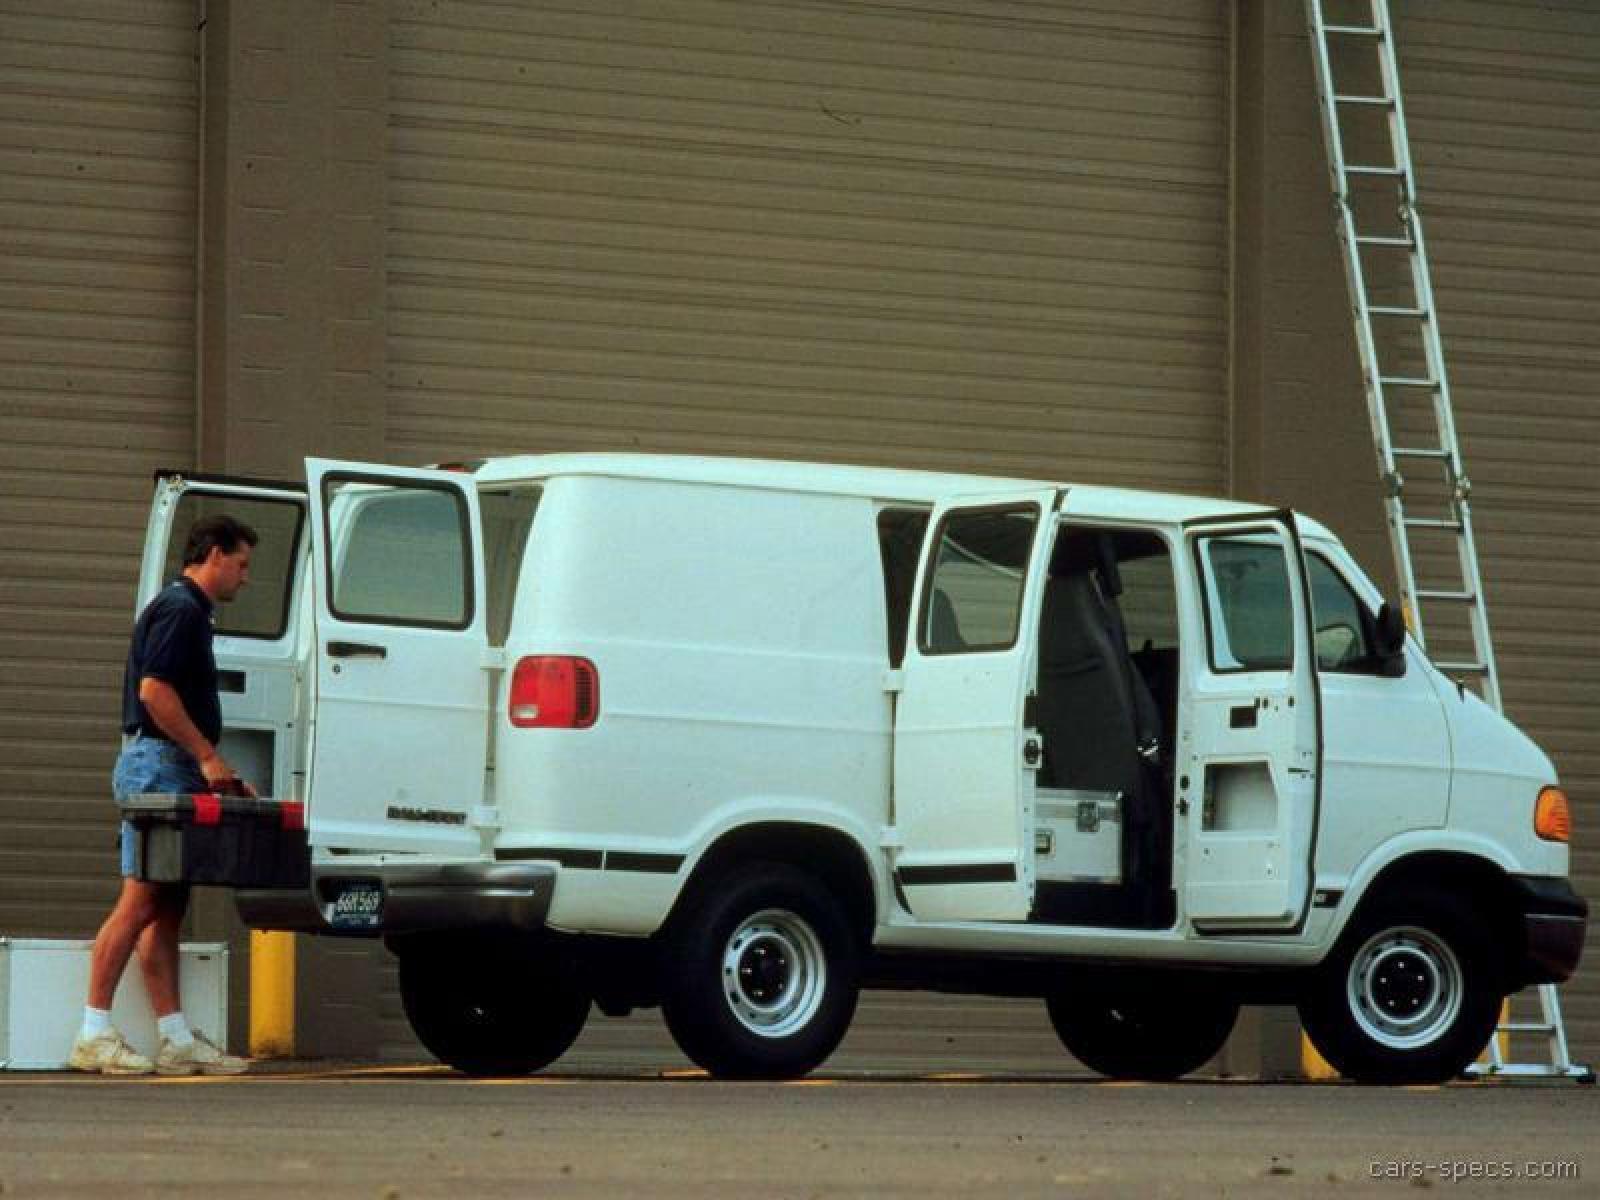 800 1024 1280 1600 Origin 2002 Dodge Ram Cargo